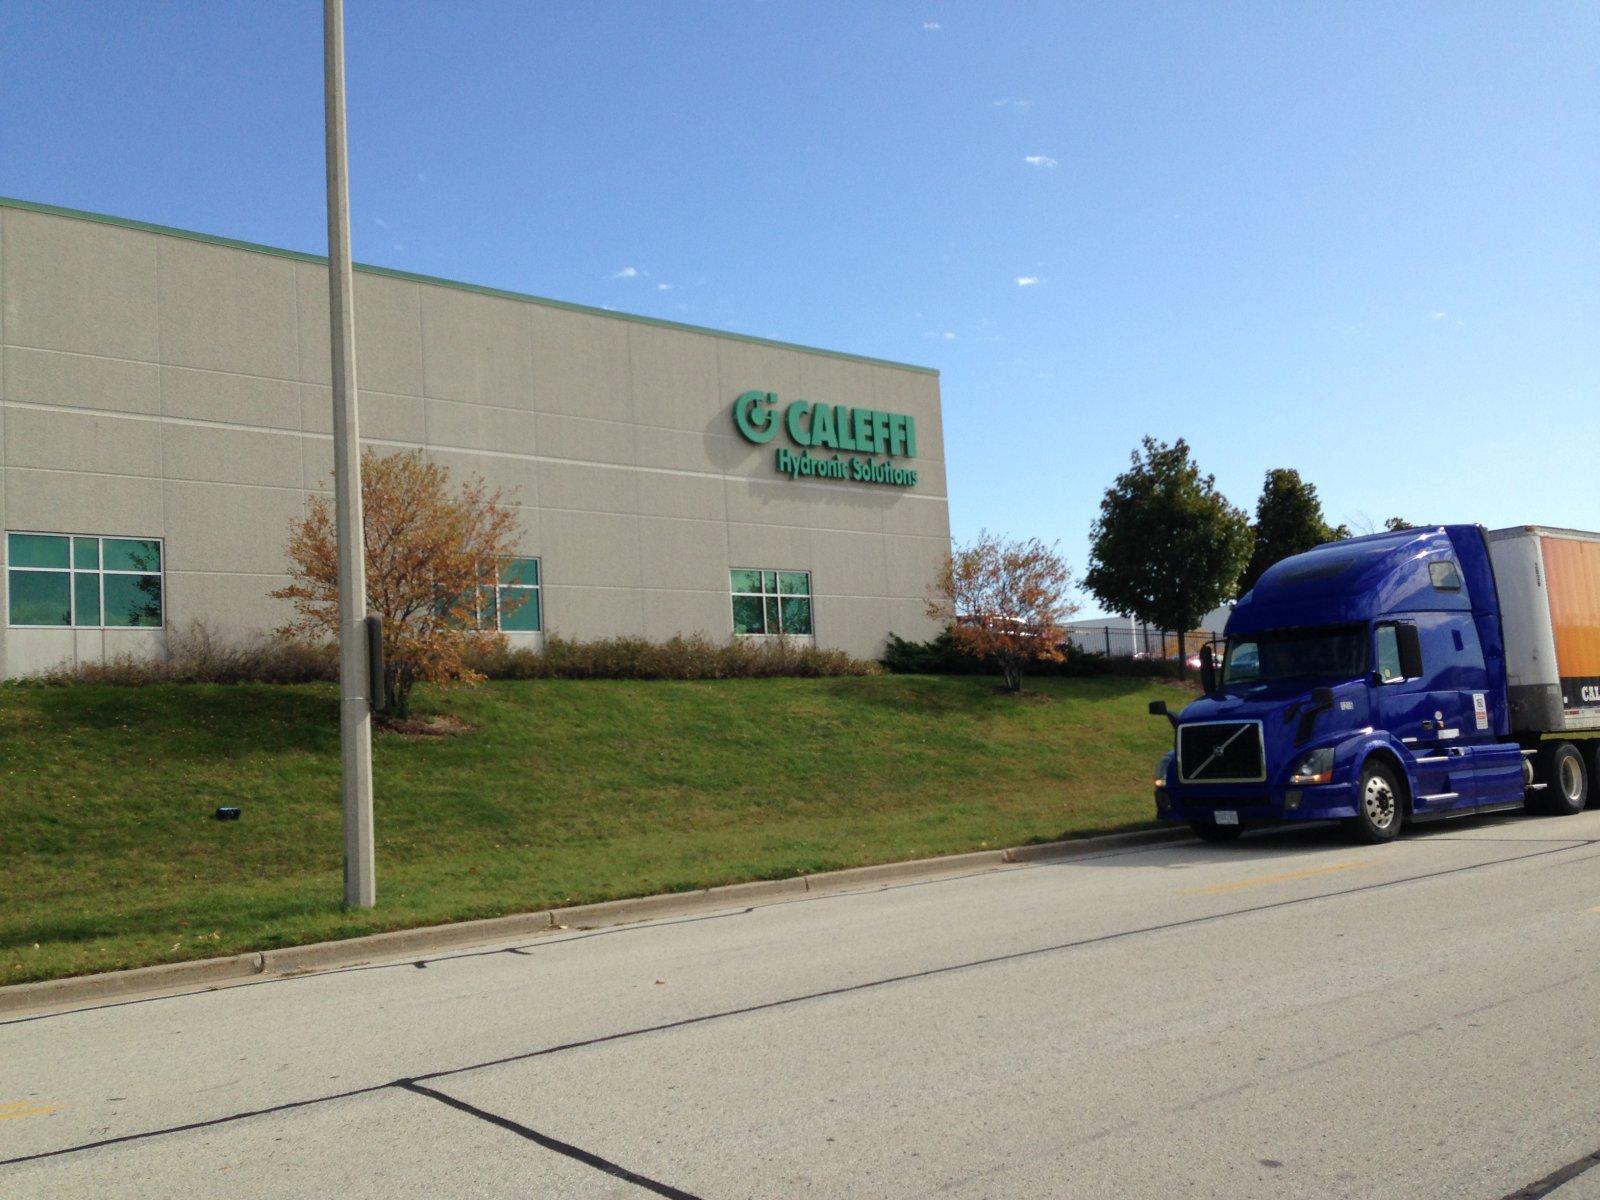 Caleffi North America Inc. 3883 W. Milwaukee Rd.